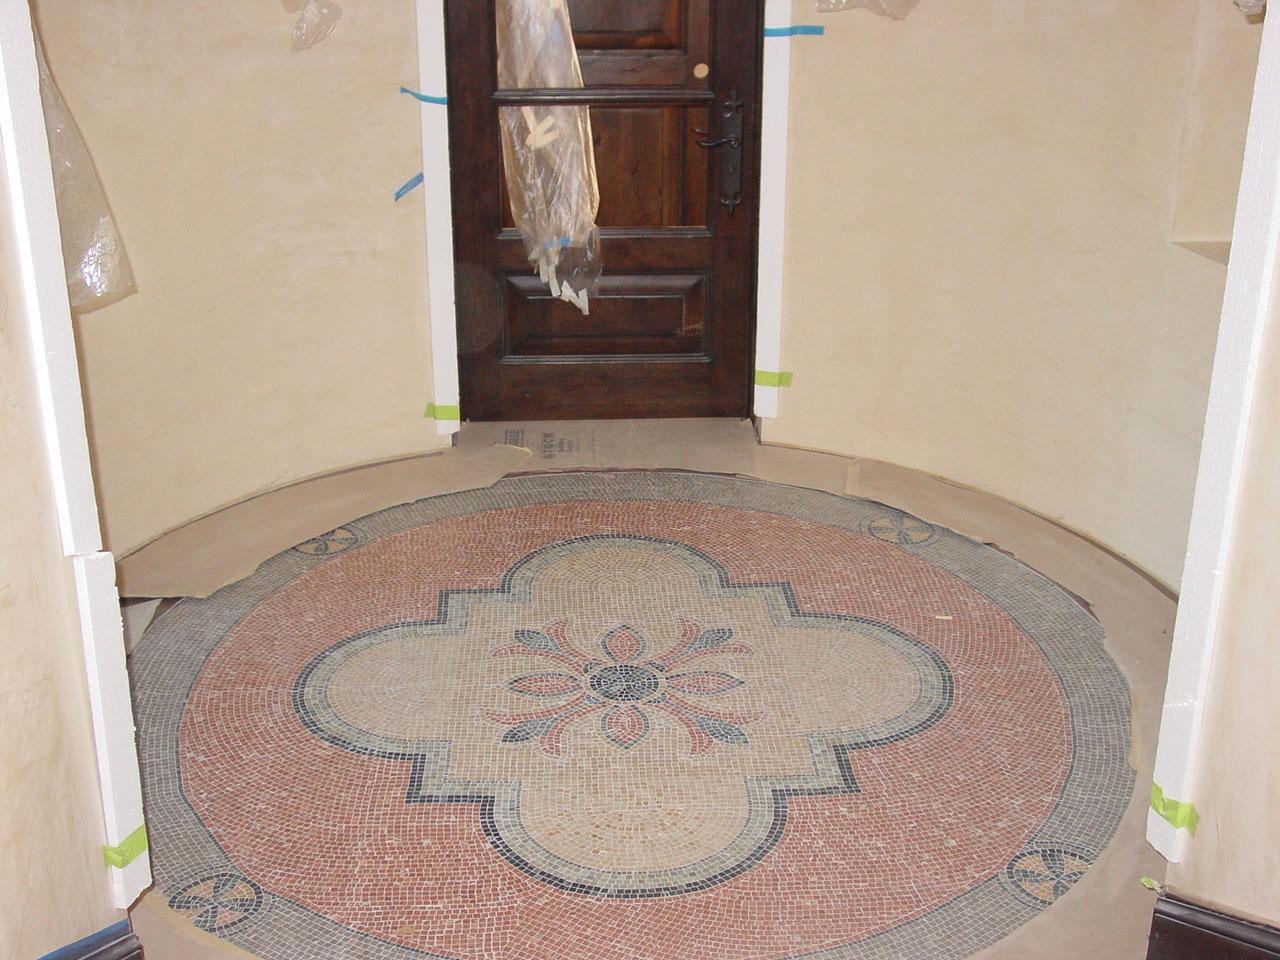 Floor tiles flooring tiles westside tile and stone mosaic medallion floor dailygadgetfo Gallery